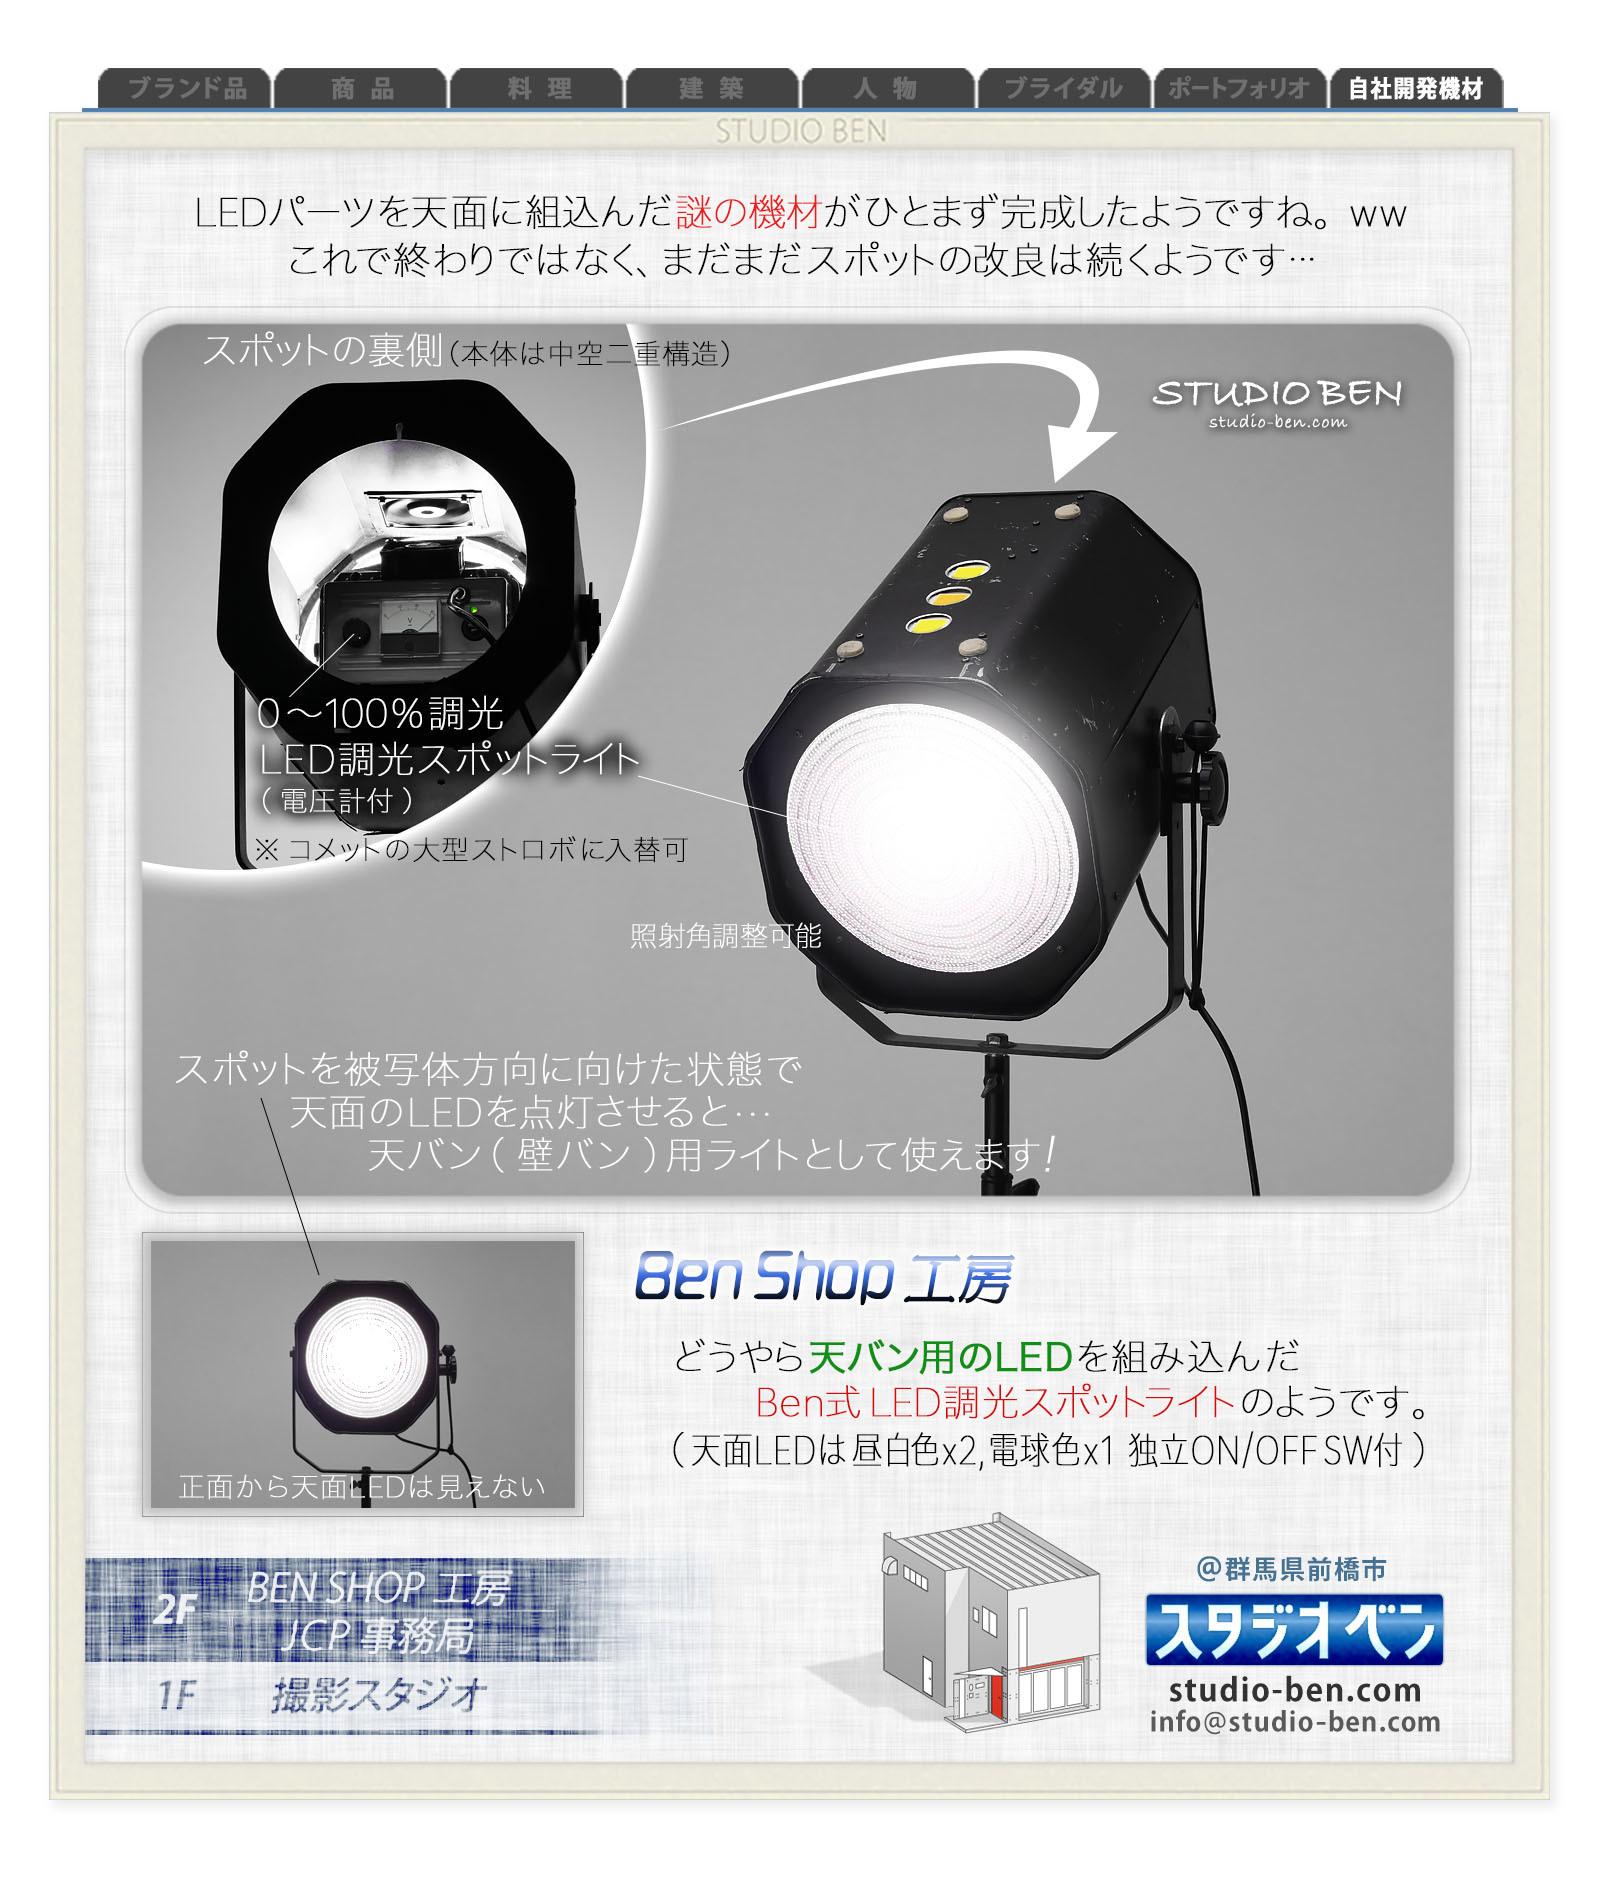 LED照明機材の改良 - No.⑤ / あなたの予測は絶対当たらない!_c0210599_03191680.jpg